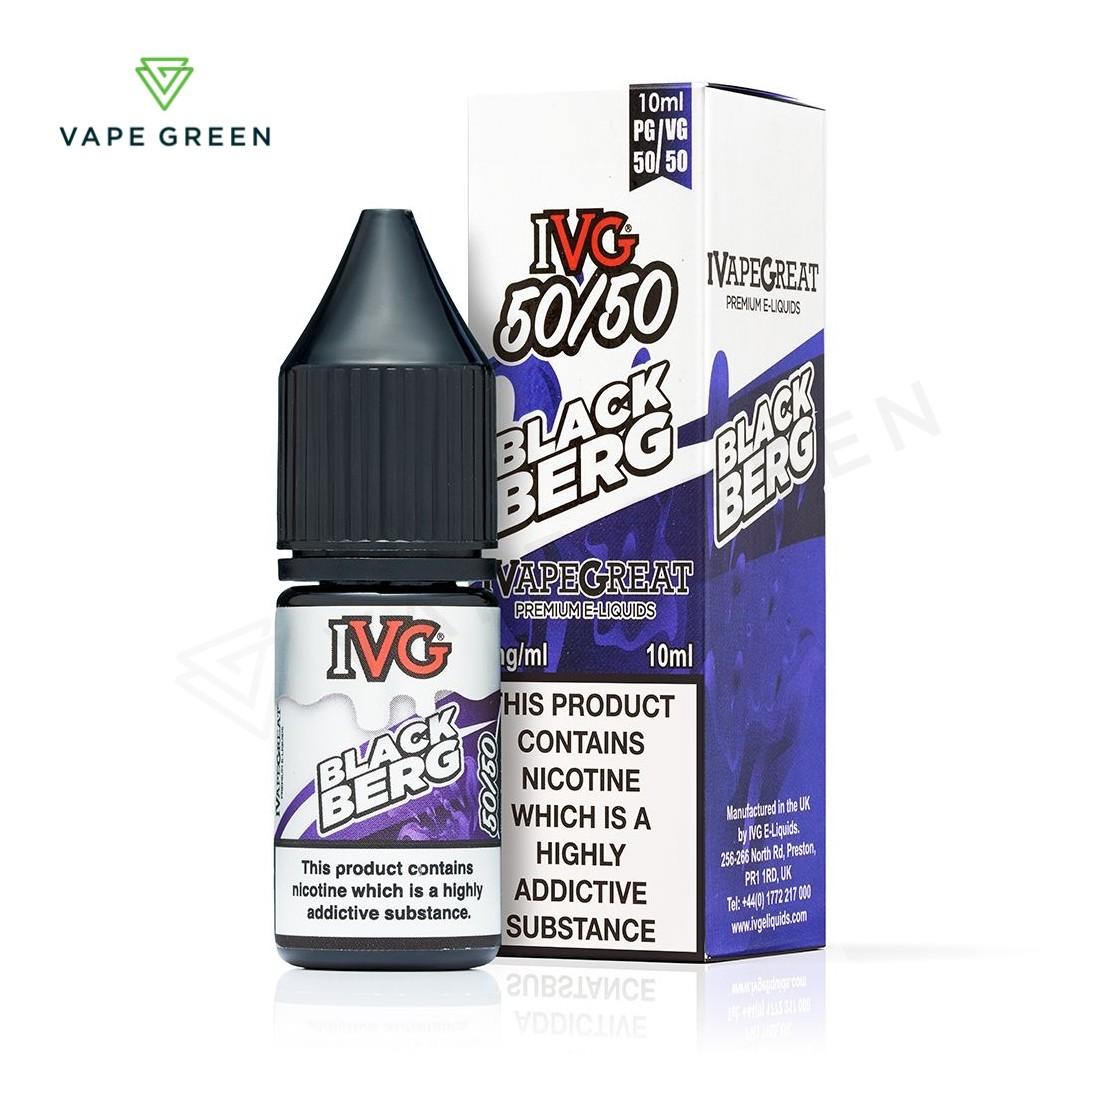 Blackberg E-Liquid by IVG Menthol 50/50